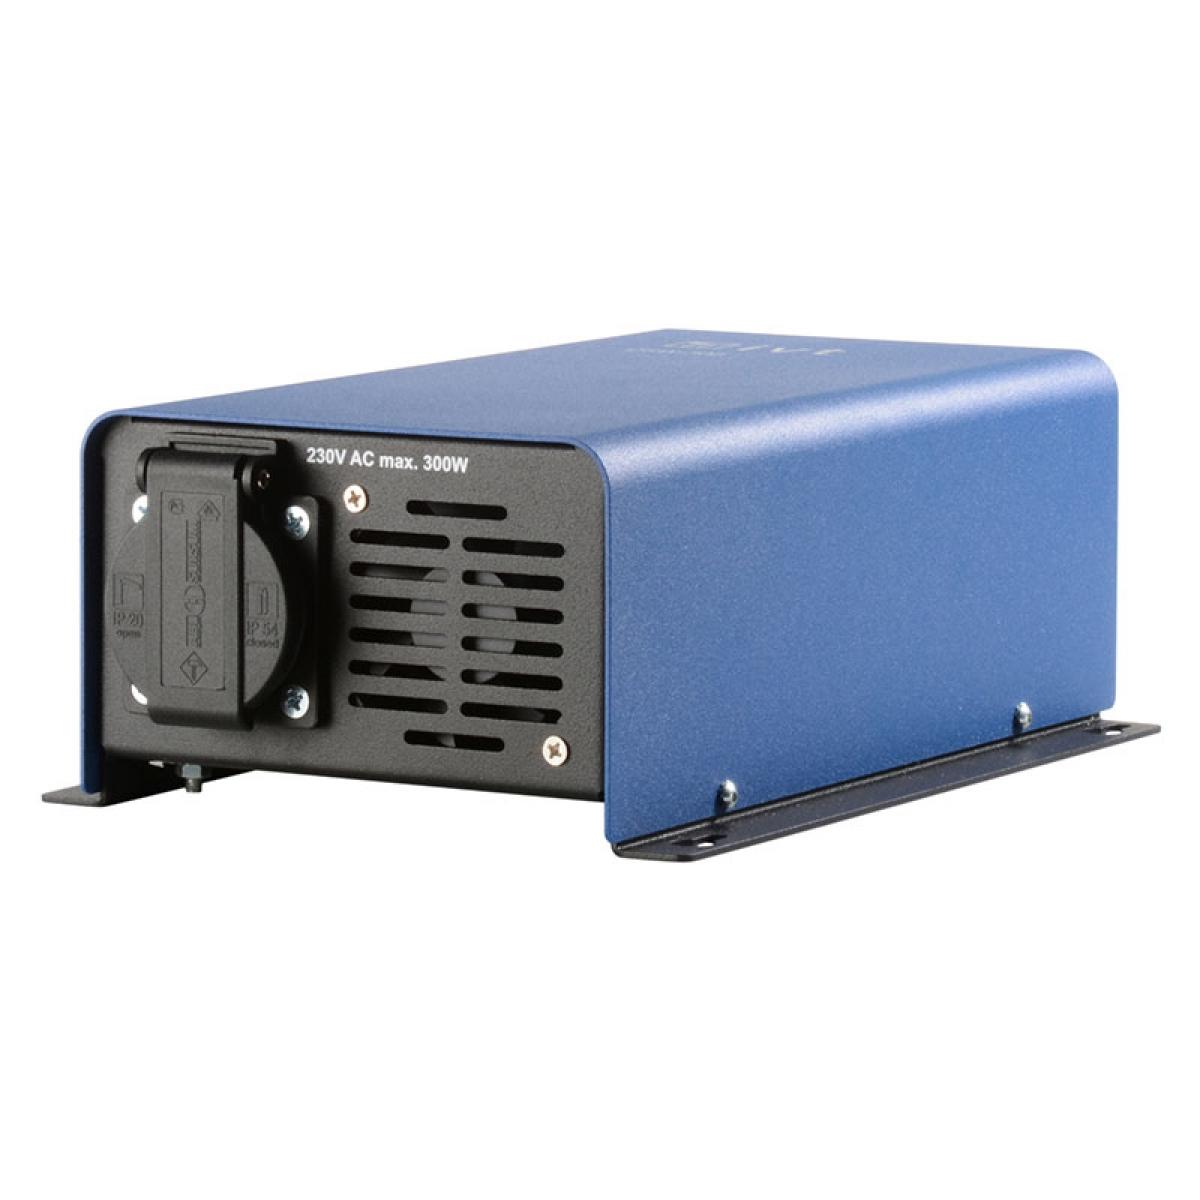 Digitaler Sinus Wechselrichter DSW-300, 24 V, 300 W - IVT-Hirschau